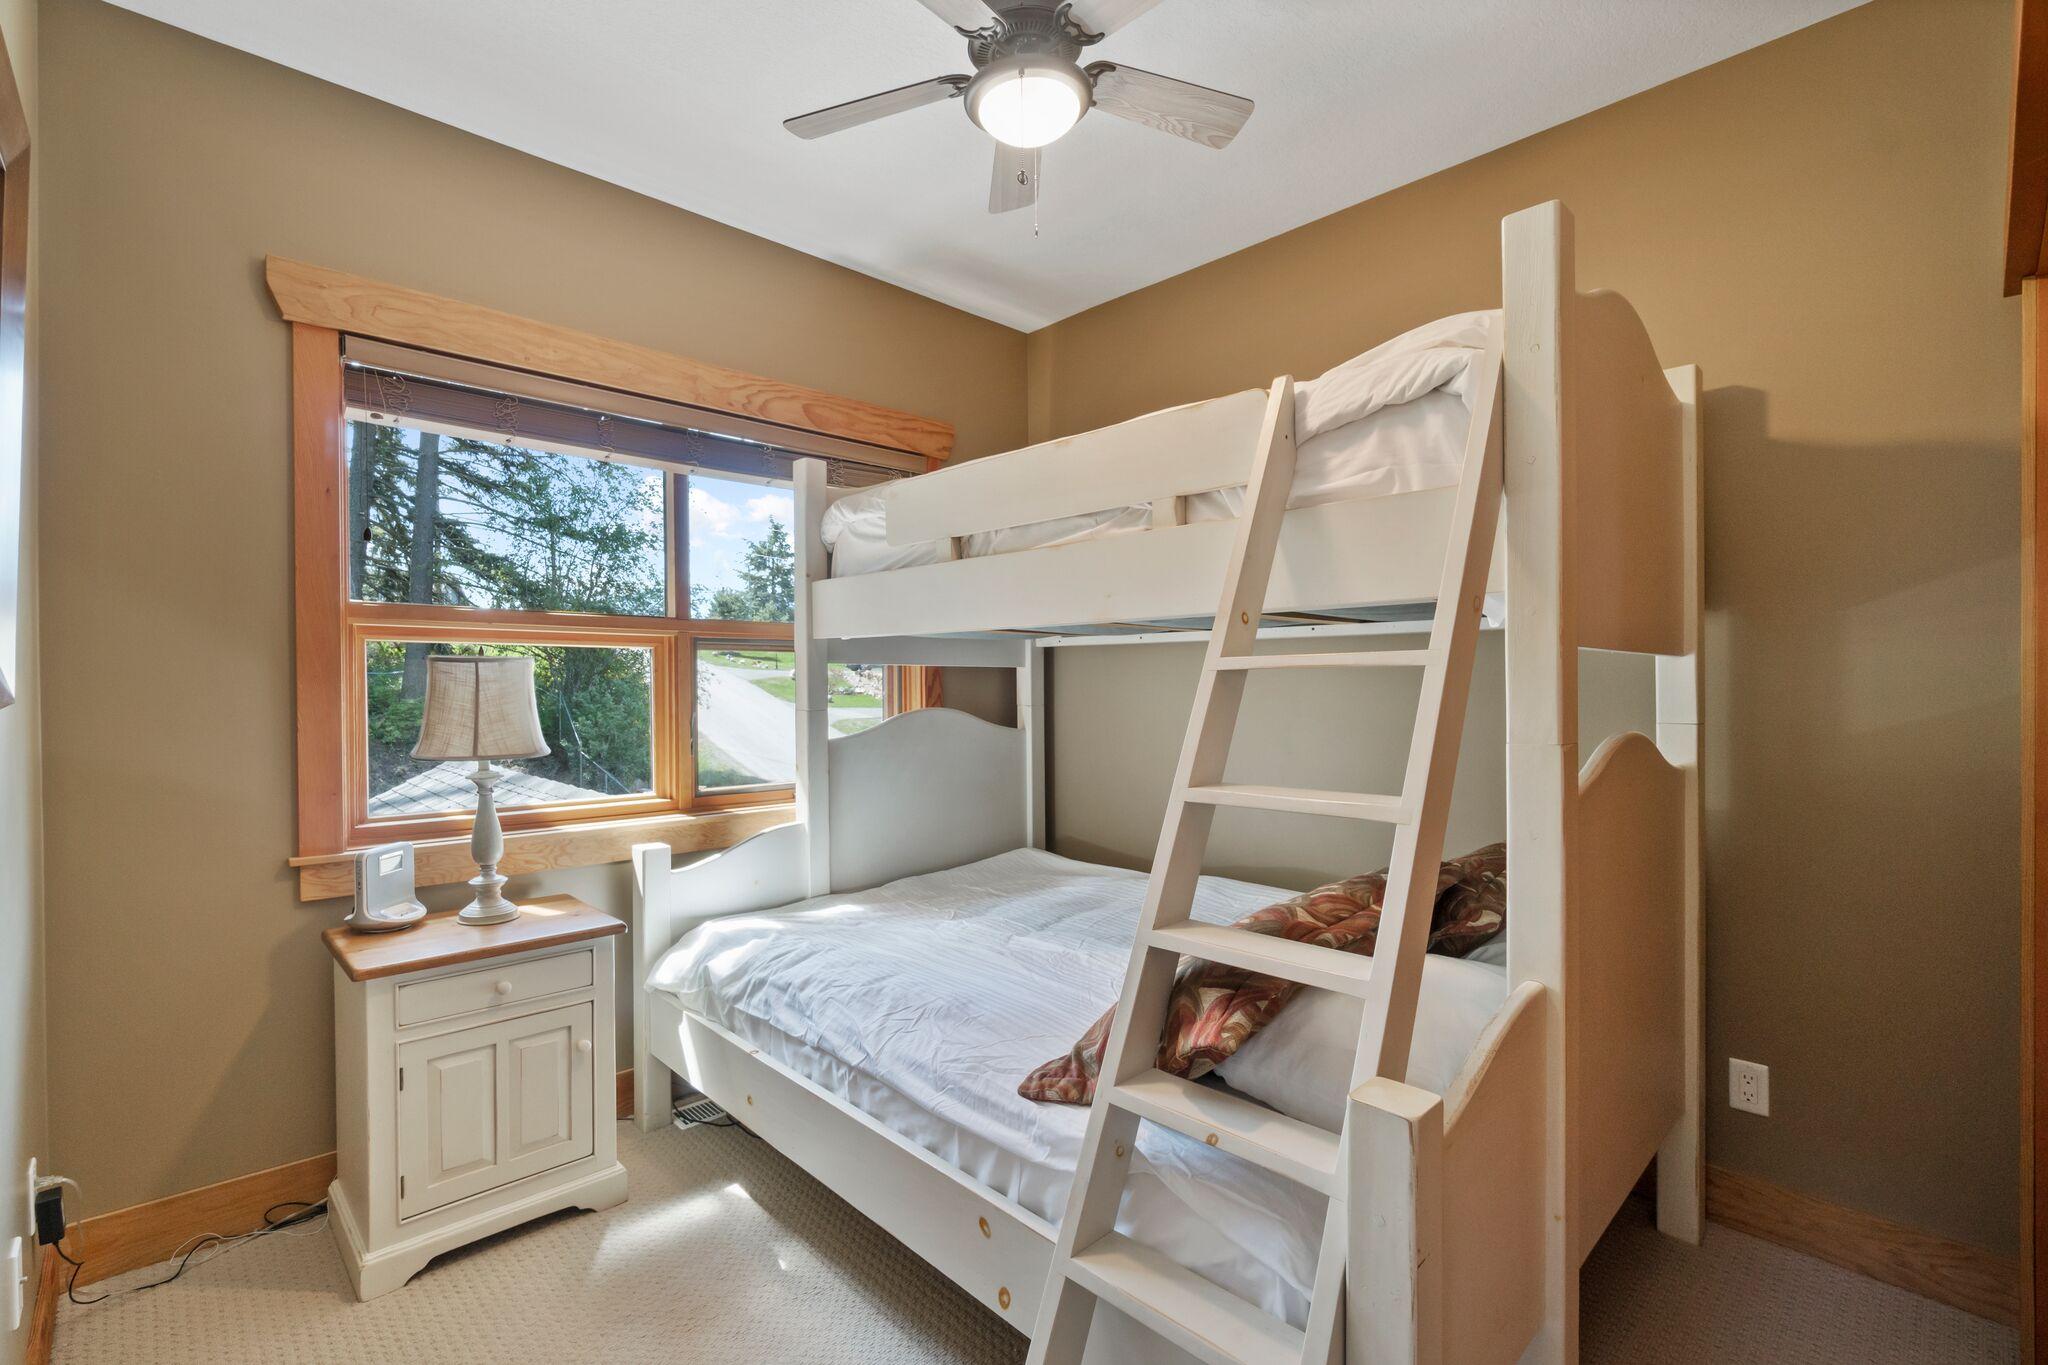 2nd Bedroom - Double/Single Bunk